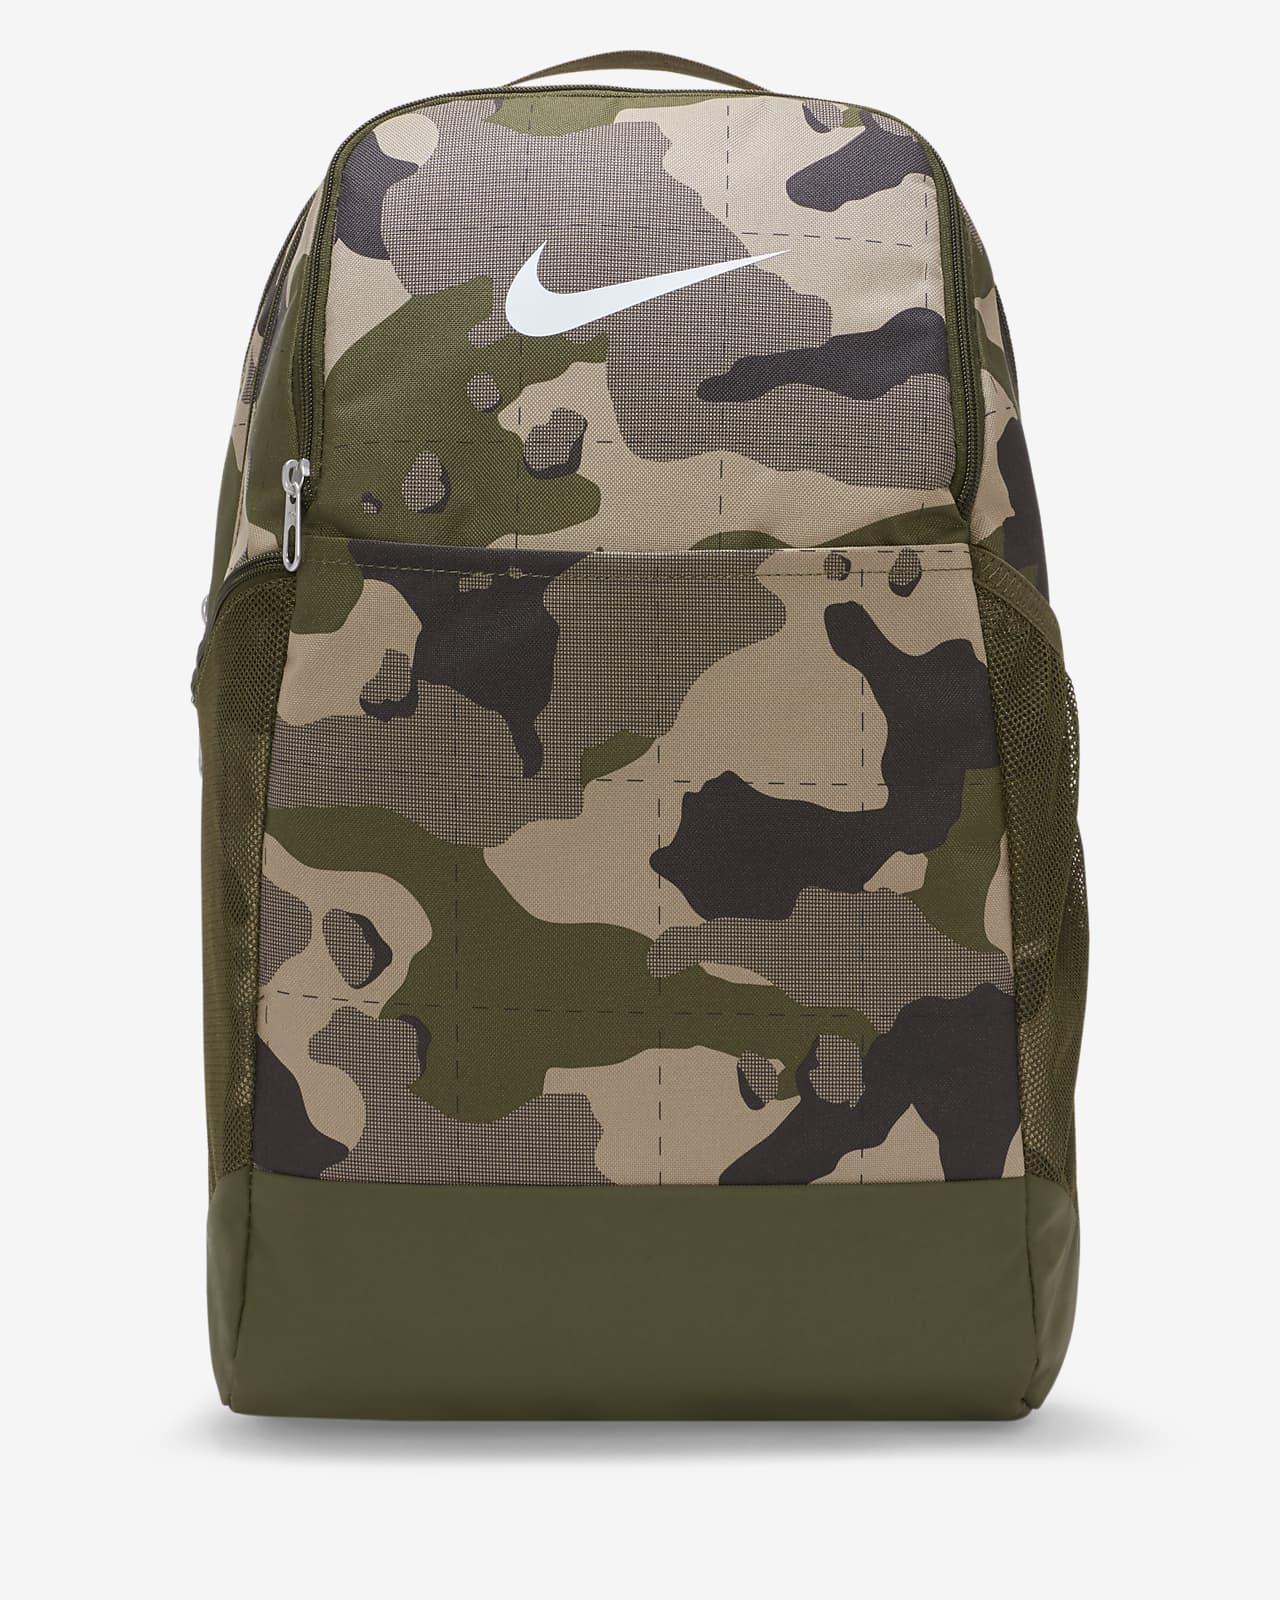 Nike Brasilia Trainings-Rucksack mit Camo-Design (Medium)